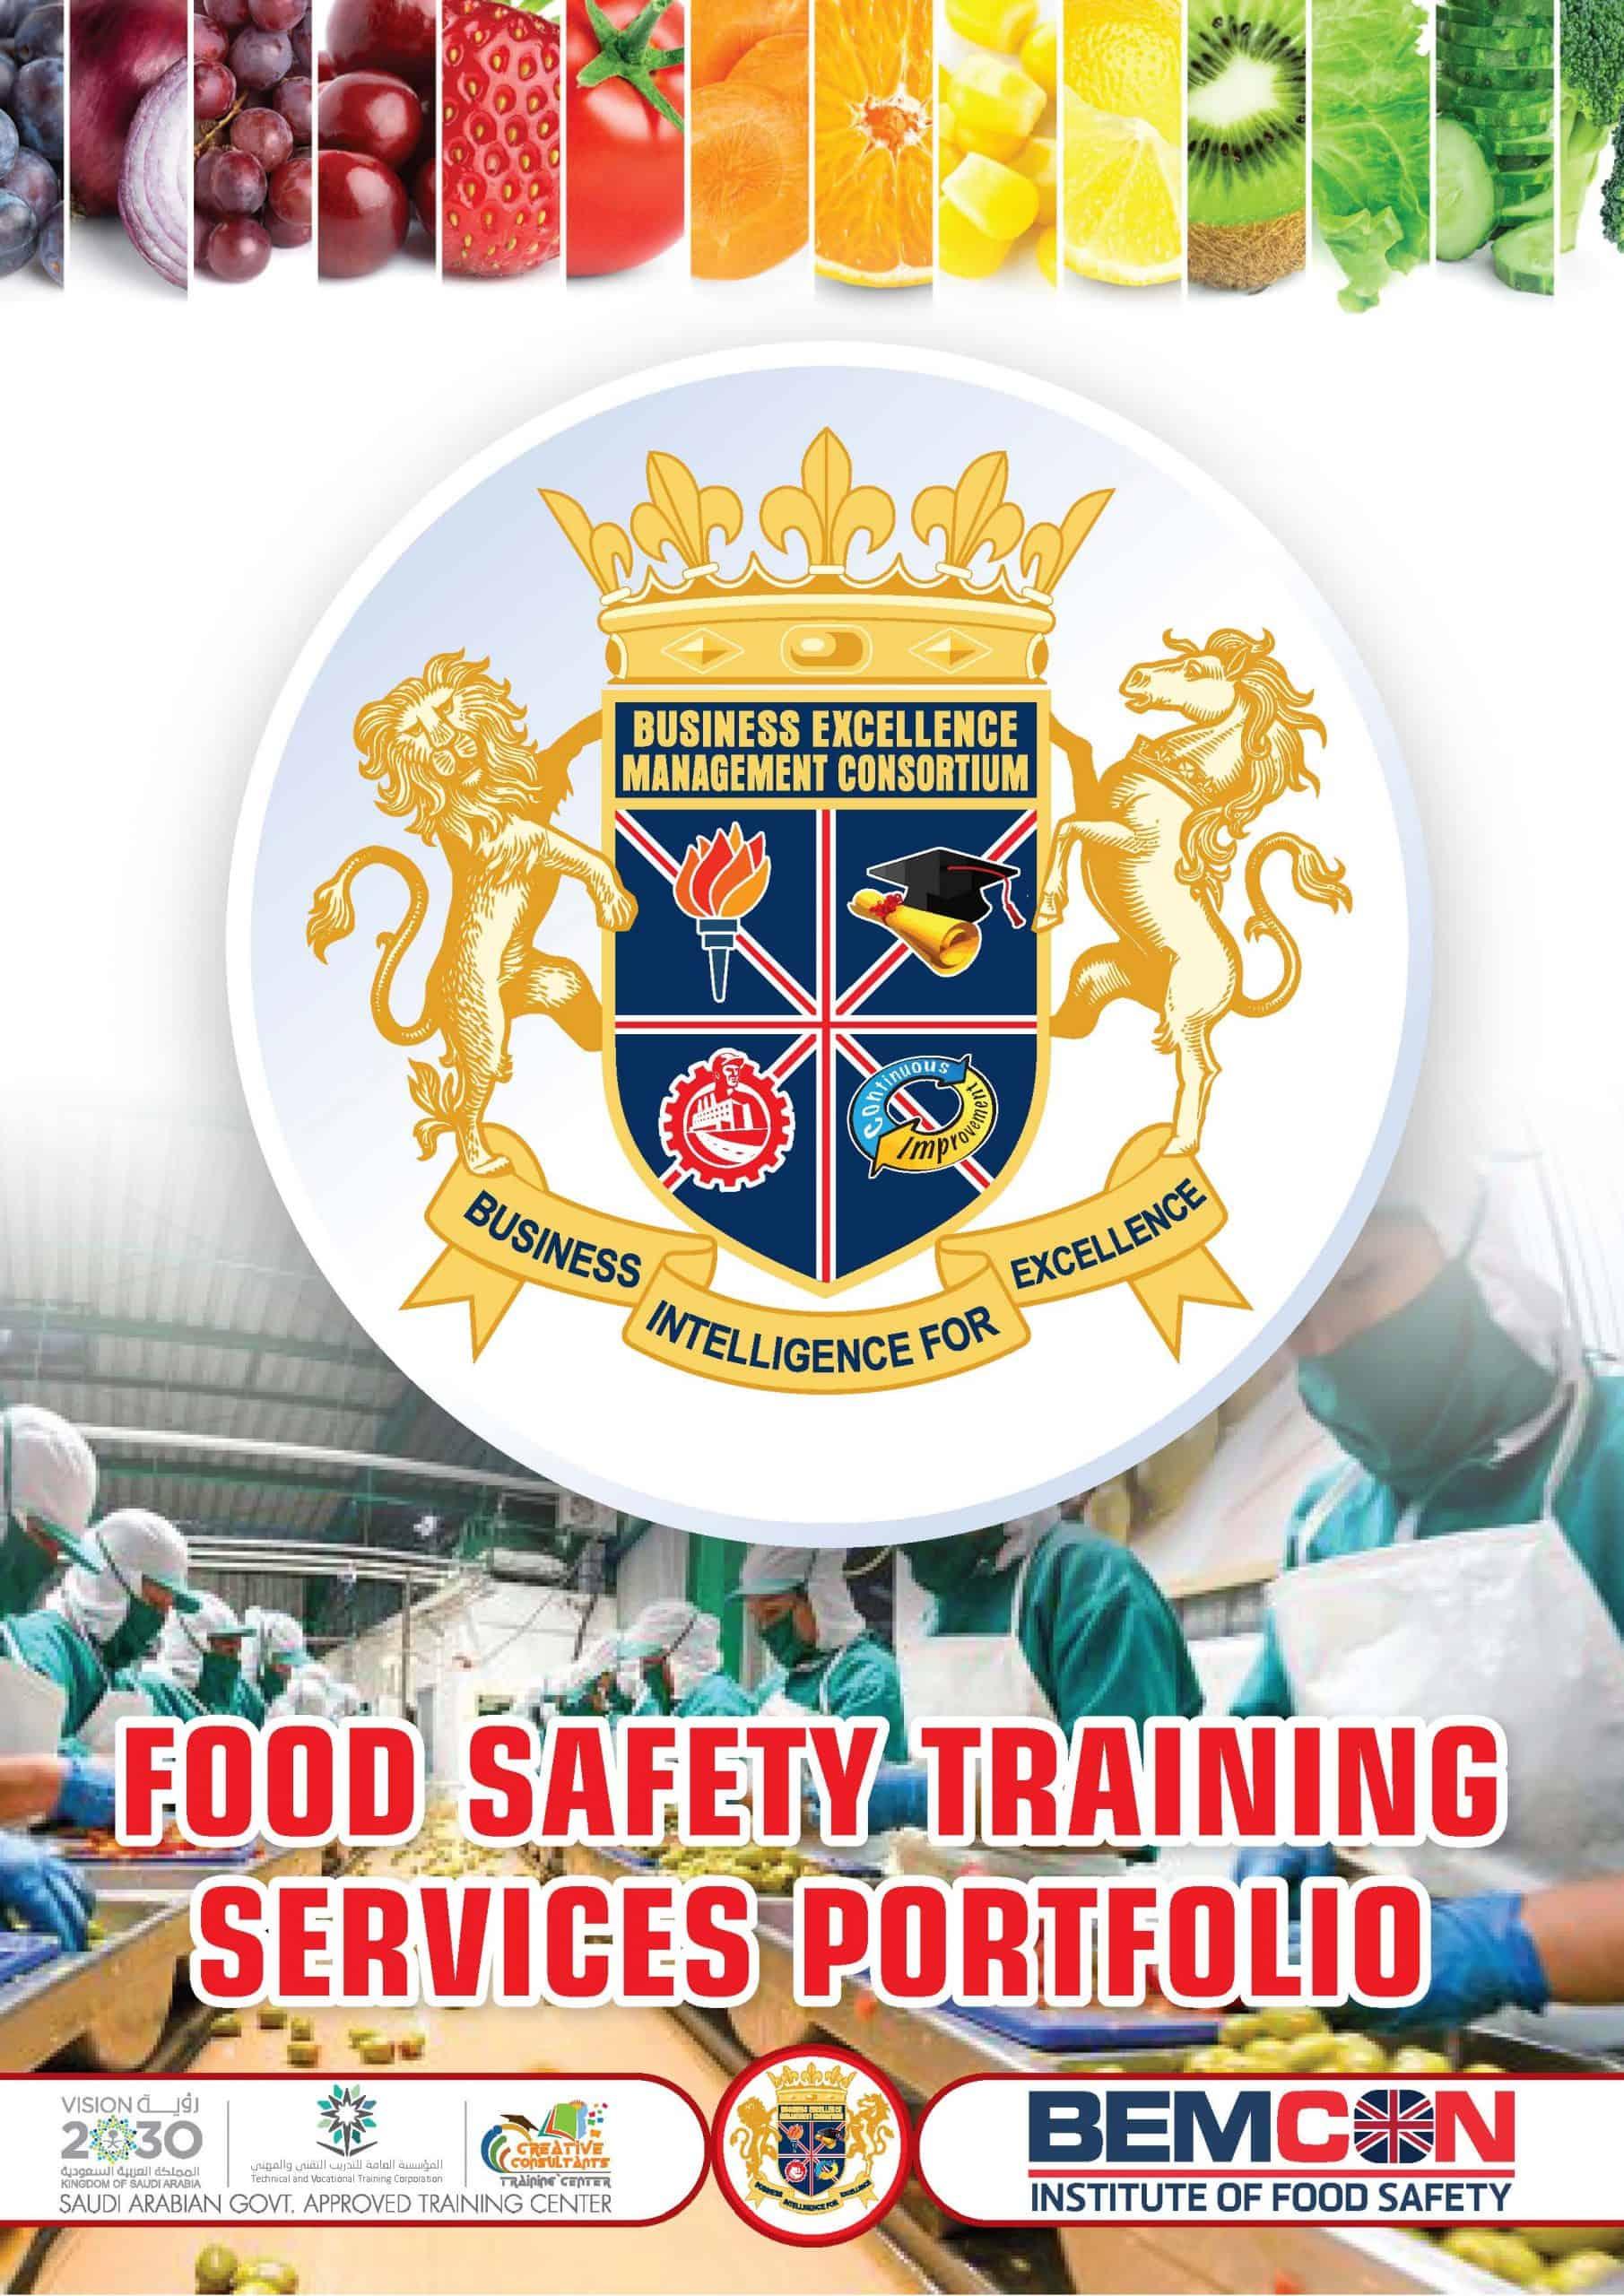 Food Safety Training Services Portfolio 2020